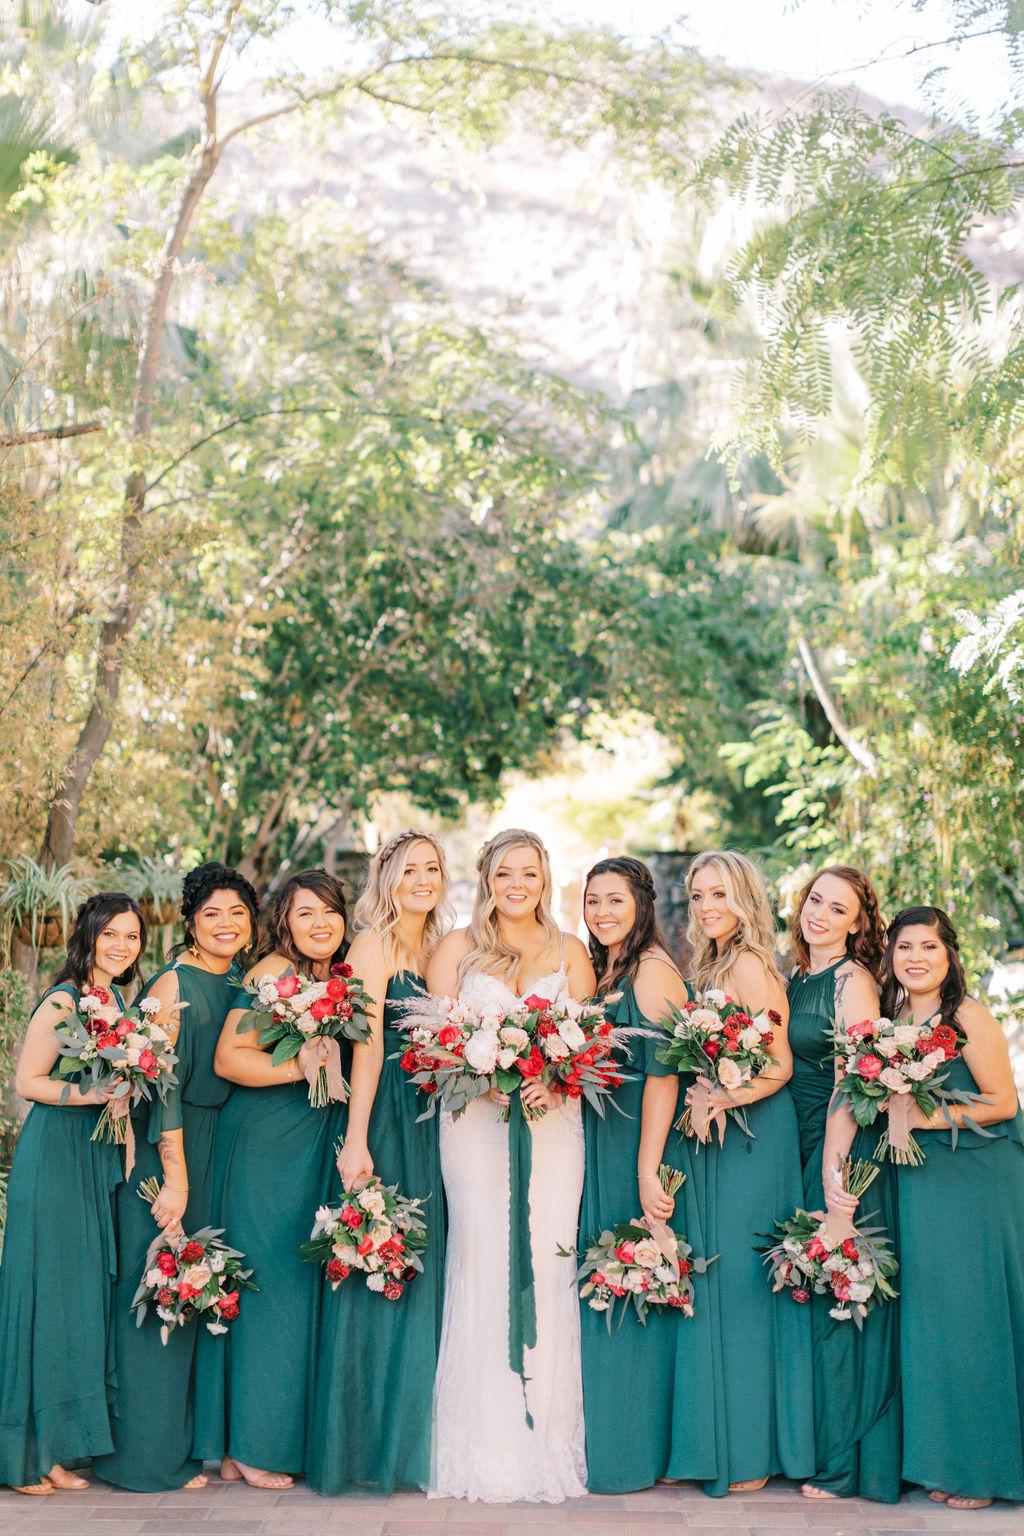 meagan robert wedding bridal party in green